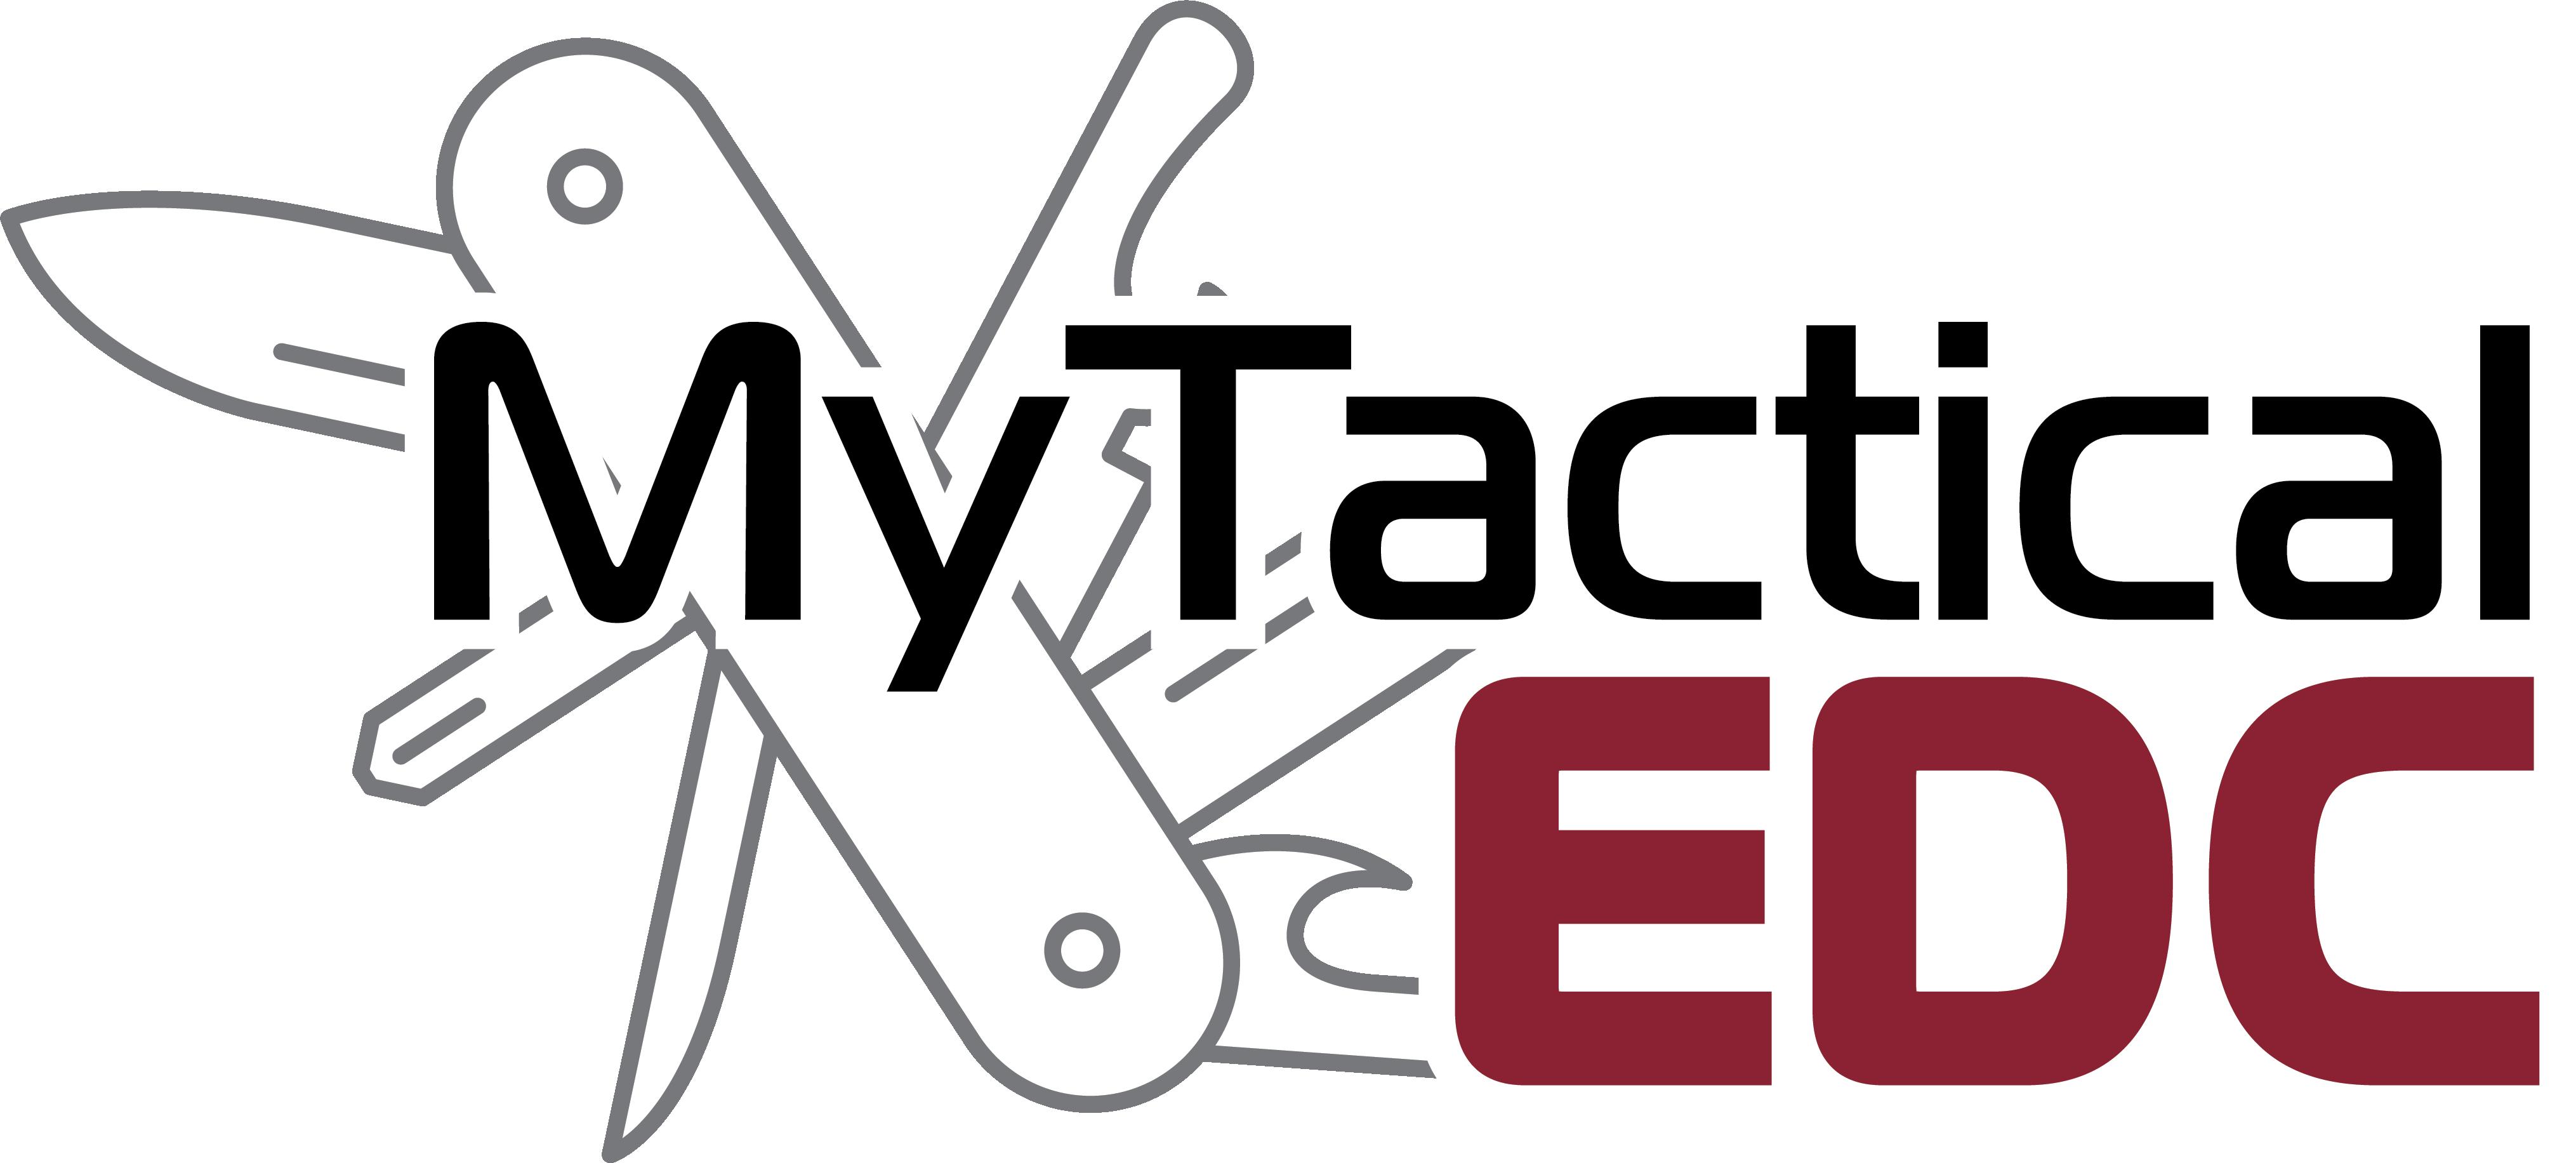 mytacticalEDC